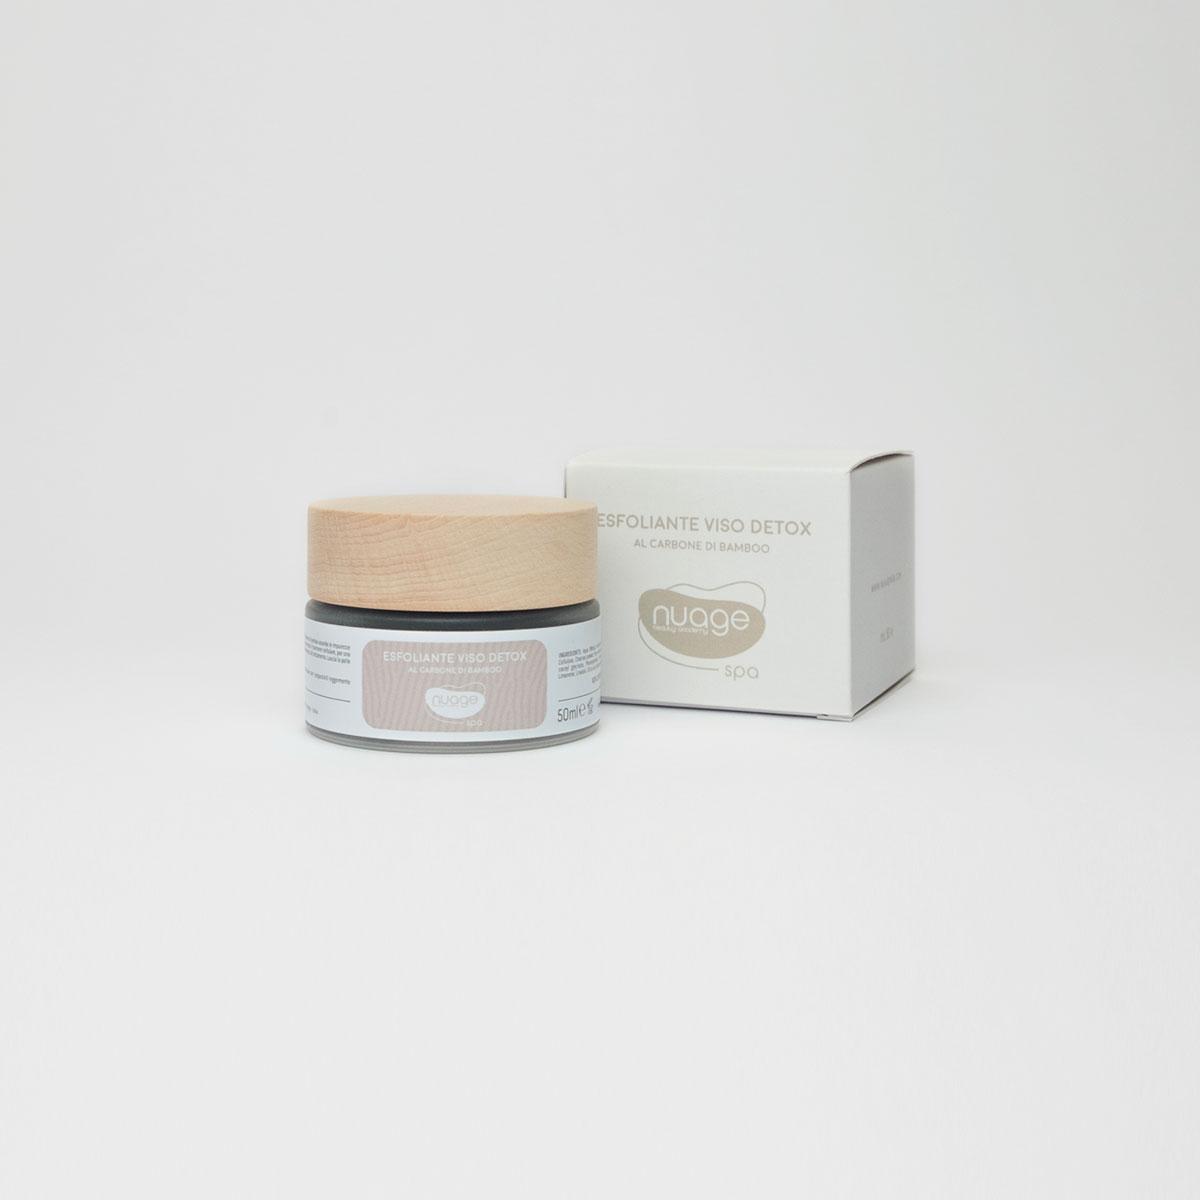 Nuage Beauty Academy Packaging - Design Umberto Angelini